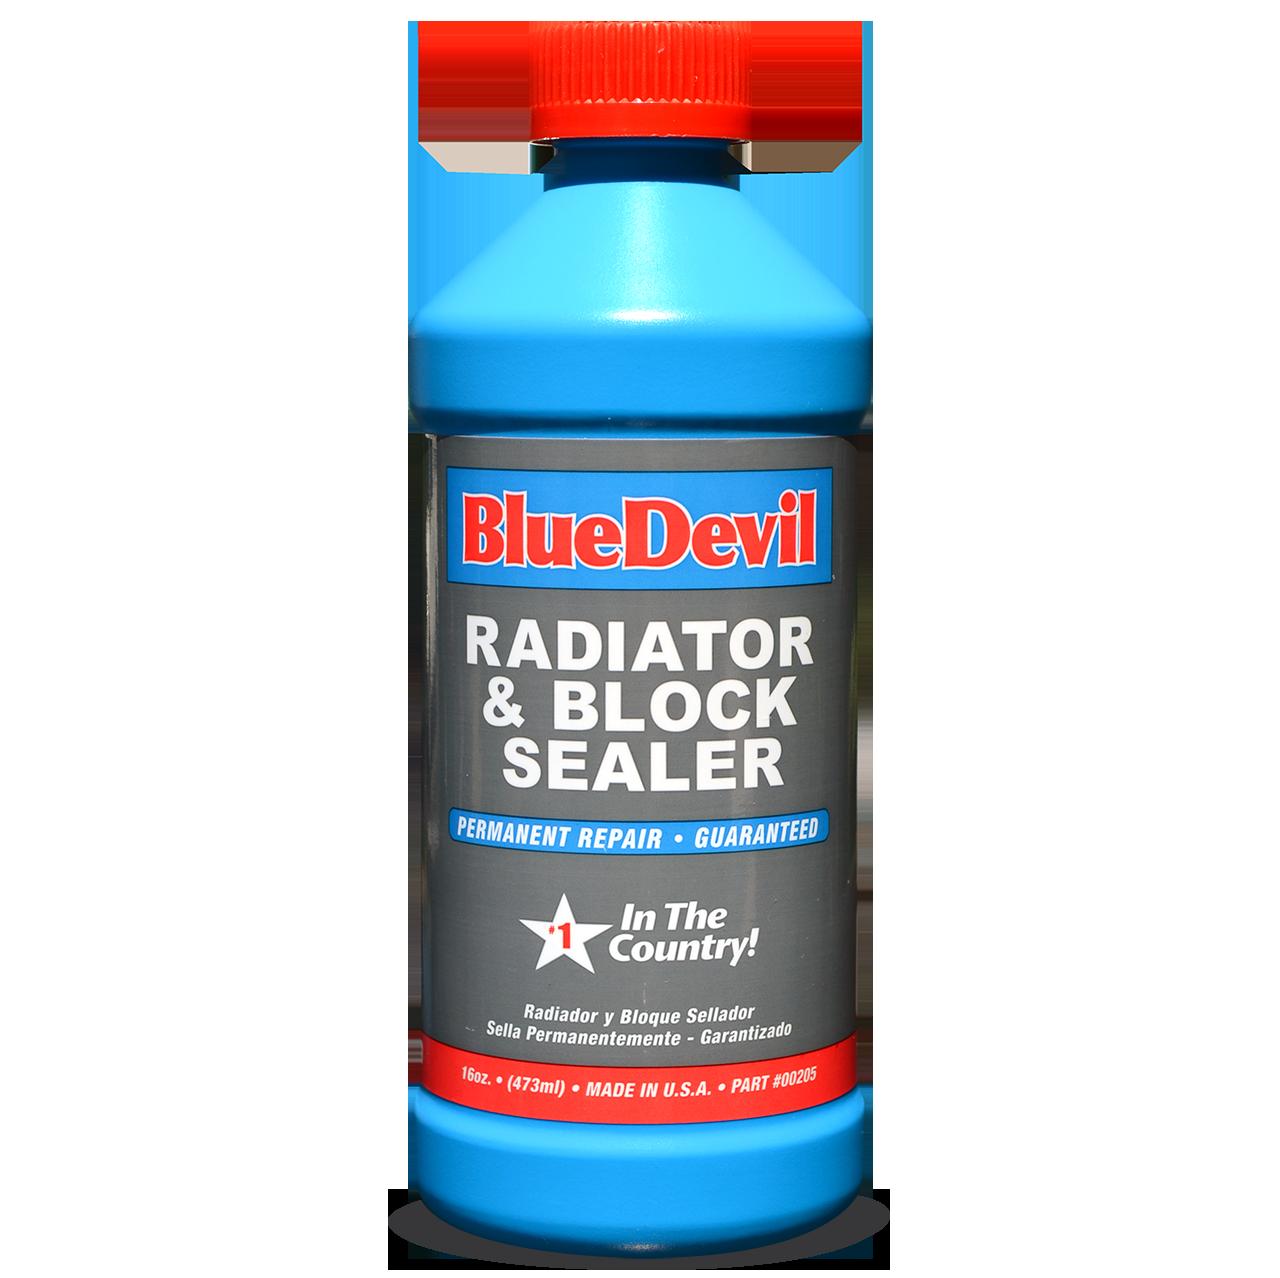 Radiator Leak Sealer Bluedevil Radiator Block Sealer